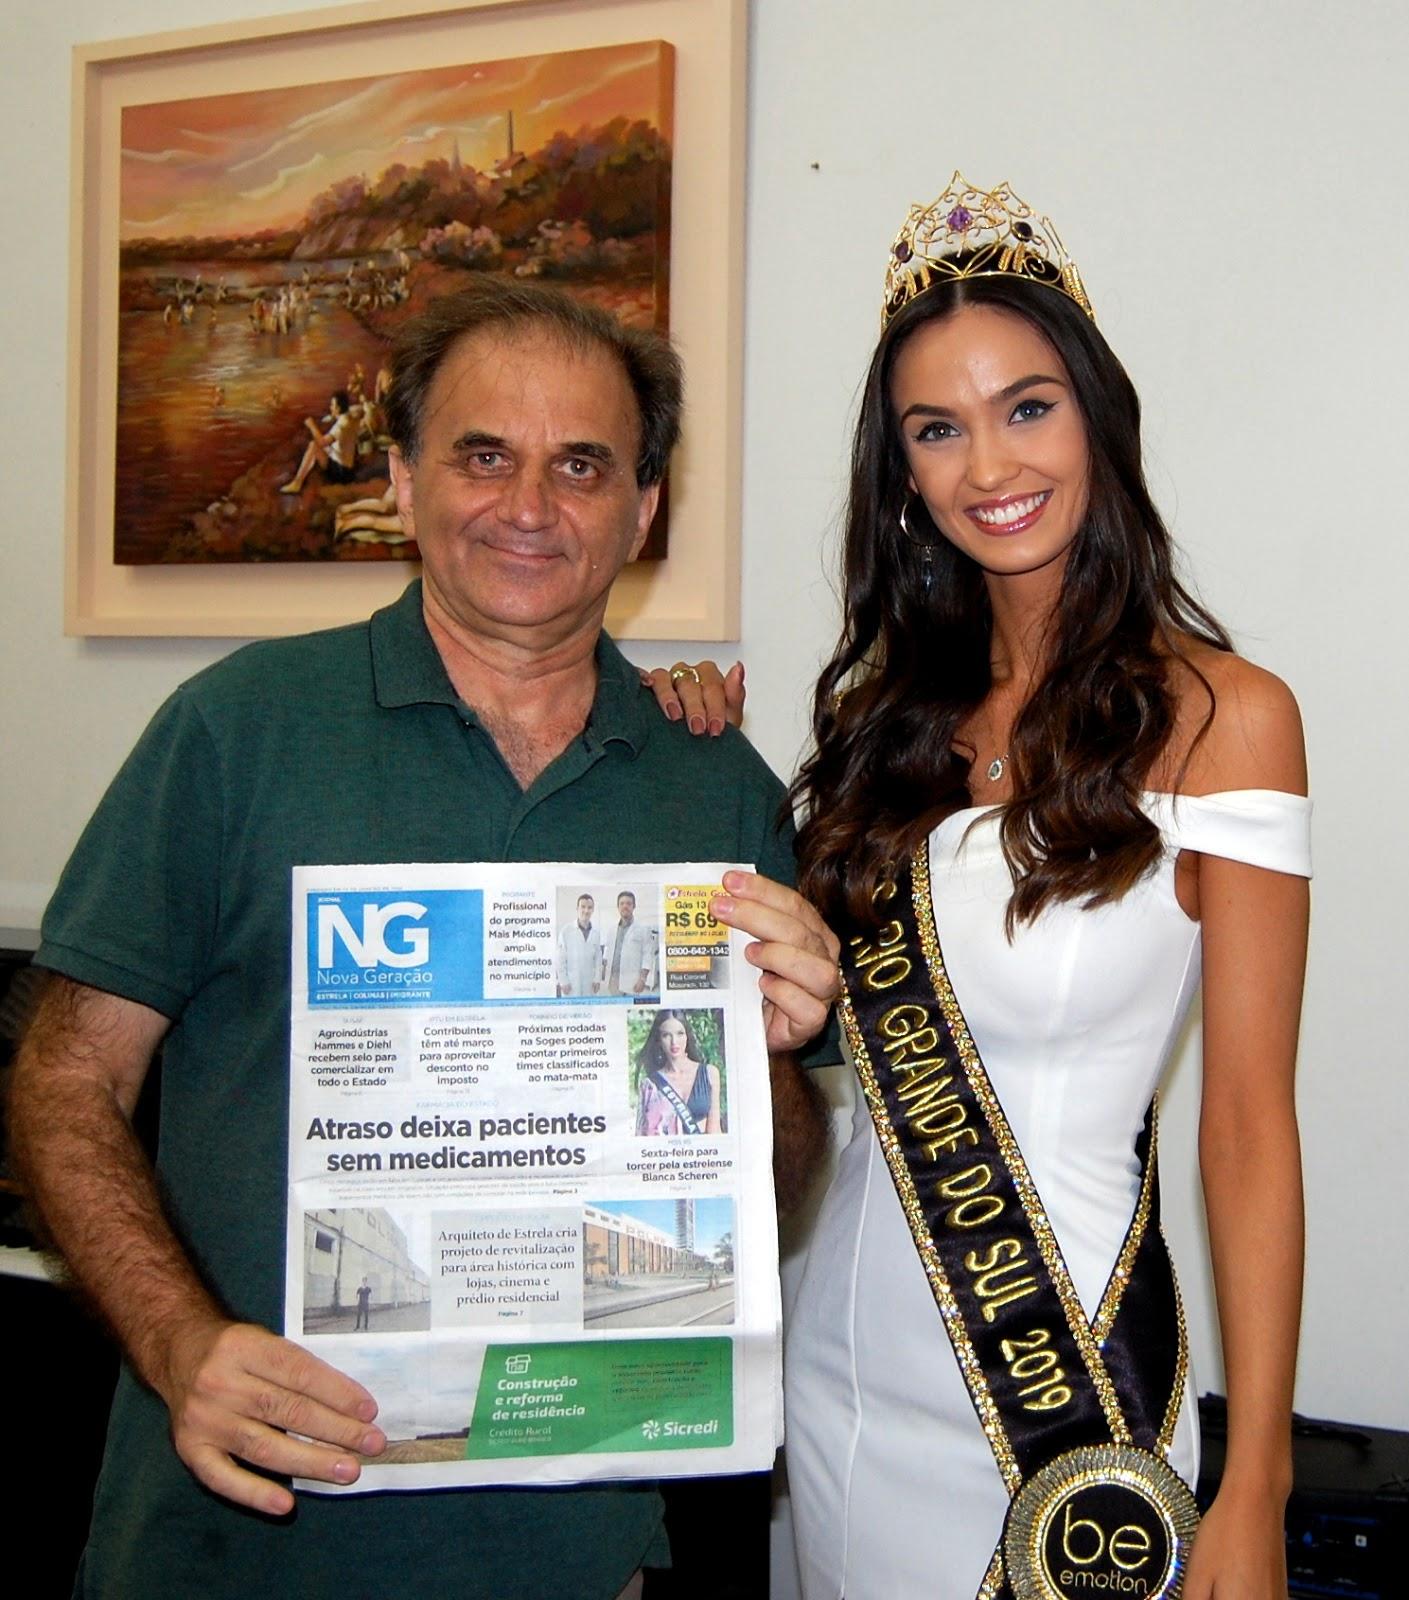 bianca scheren, top 5 de miss brasil universo 2019. - Página 5 Dsc_0019